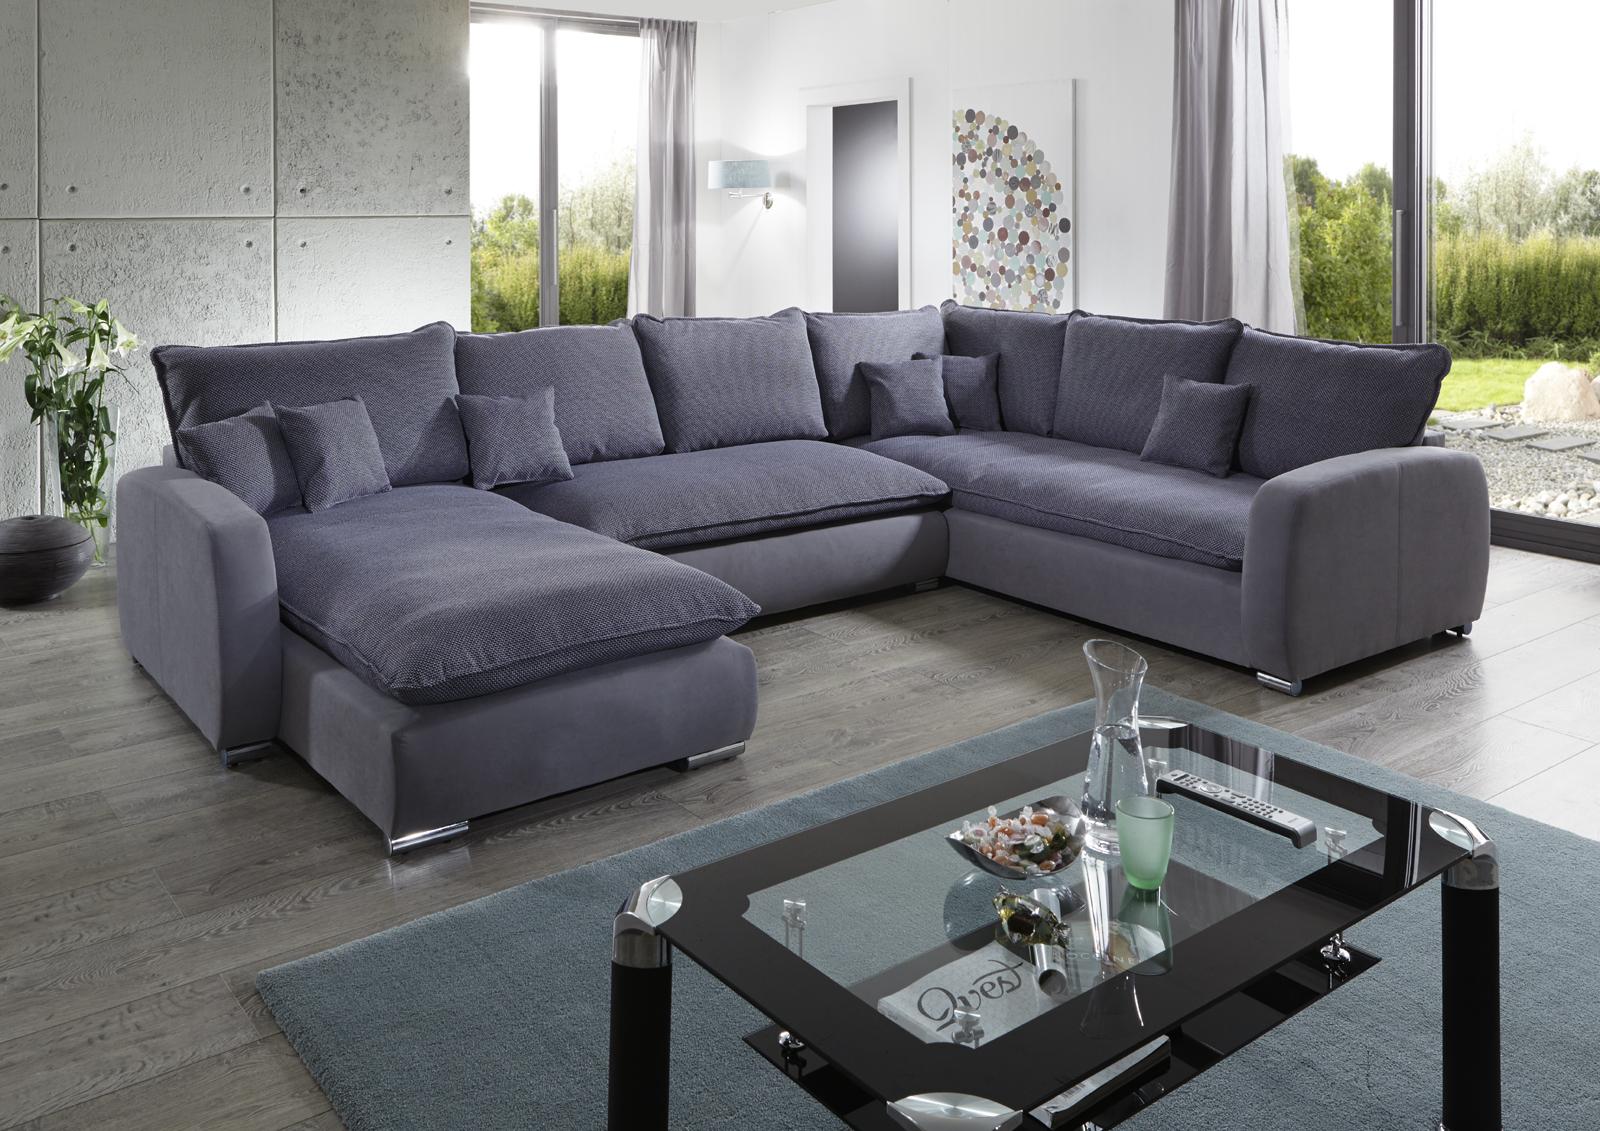 sam sofa grau wohnlandschaft scala 180 x 350 x 230 cm. Black Bedroom Furniture Sets. Home Design Ideas